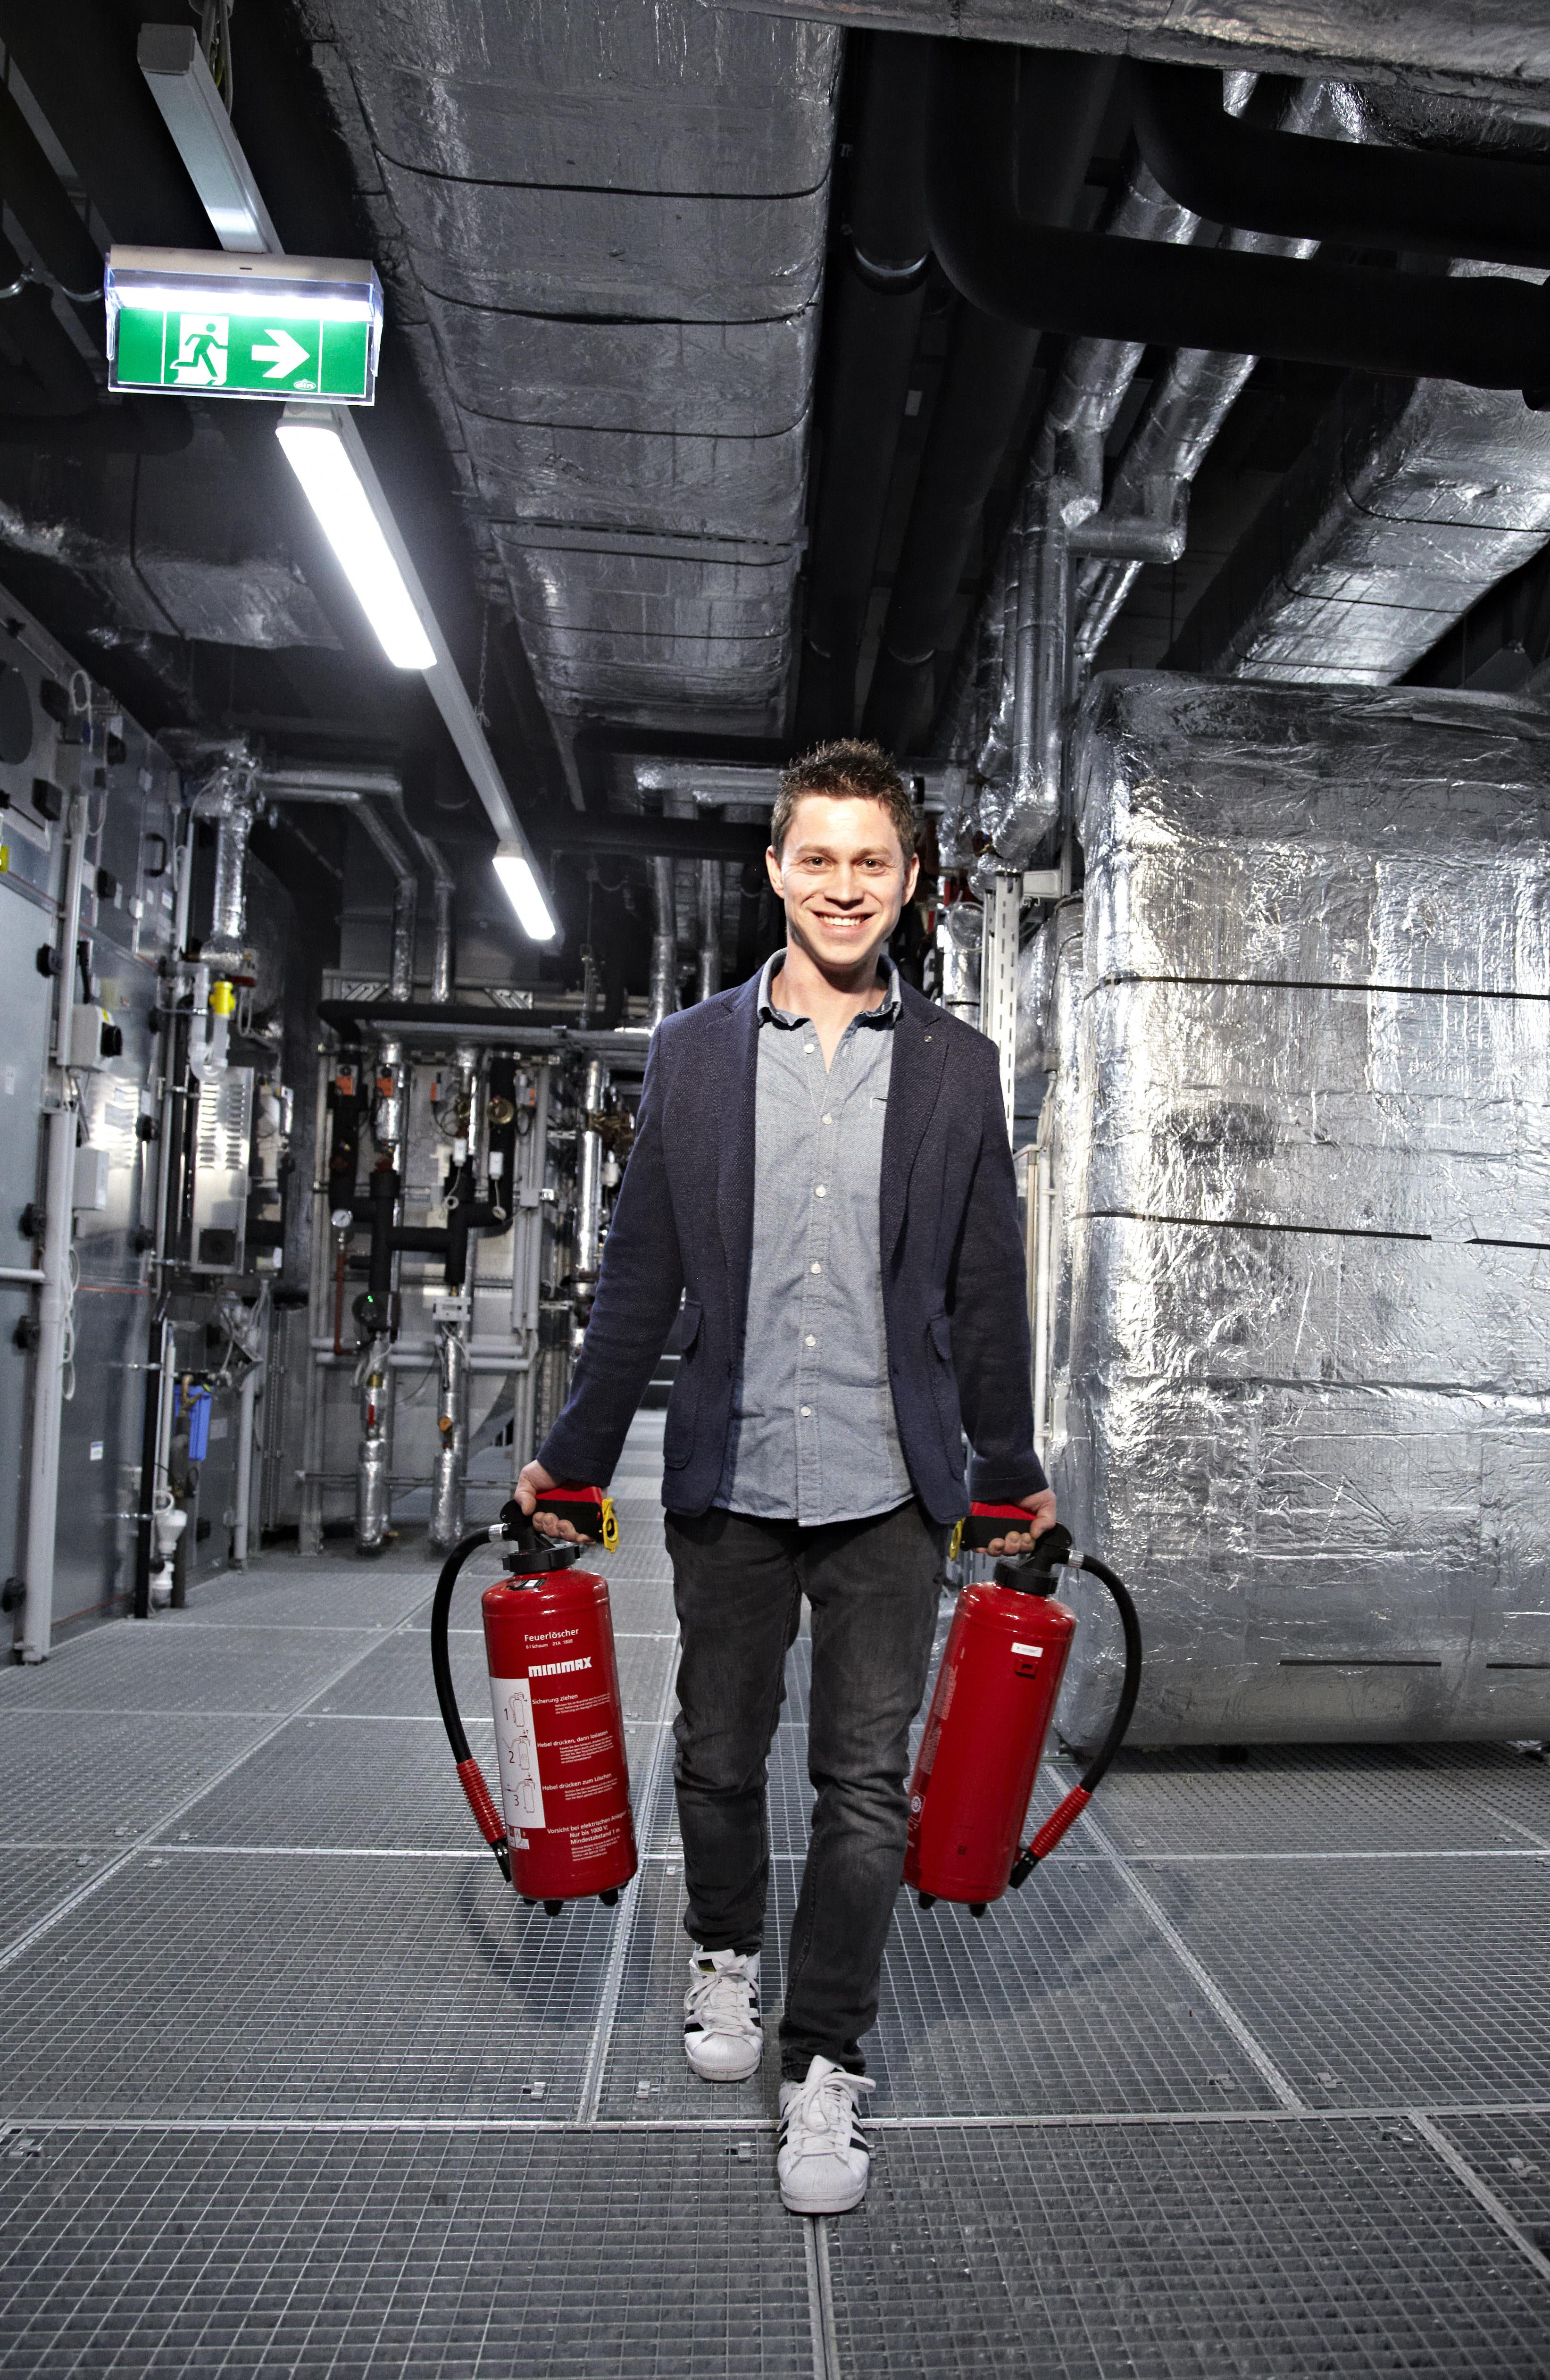 Markus Lehmerhofer, Haustechniker